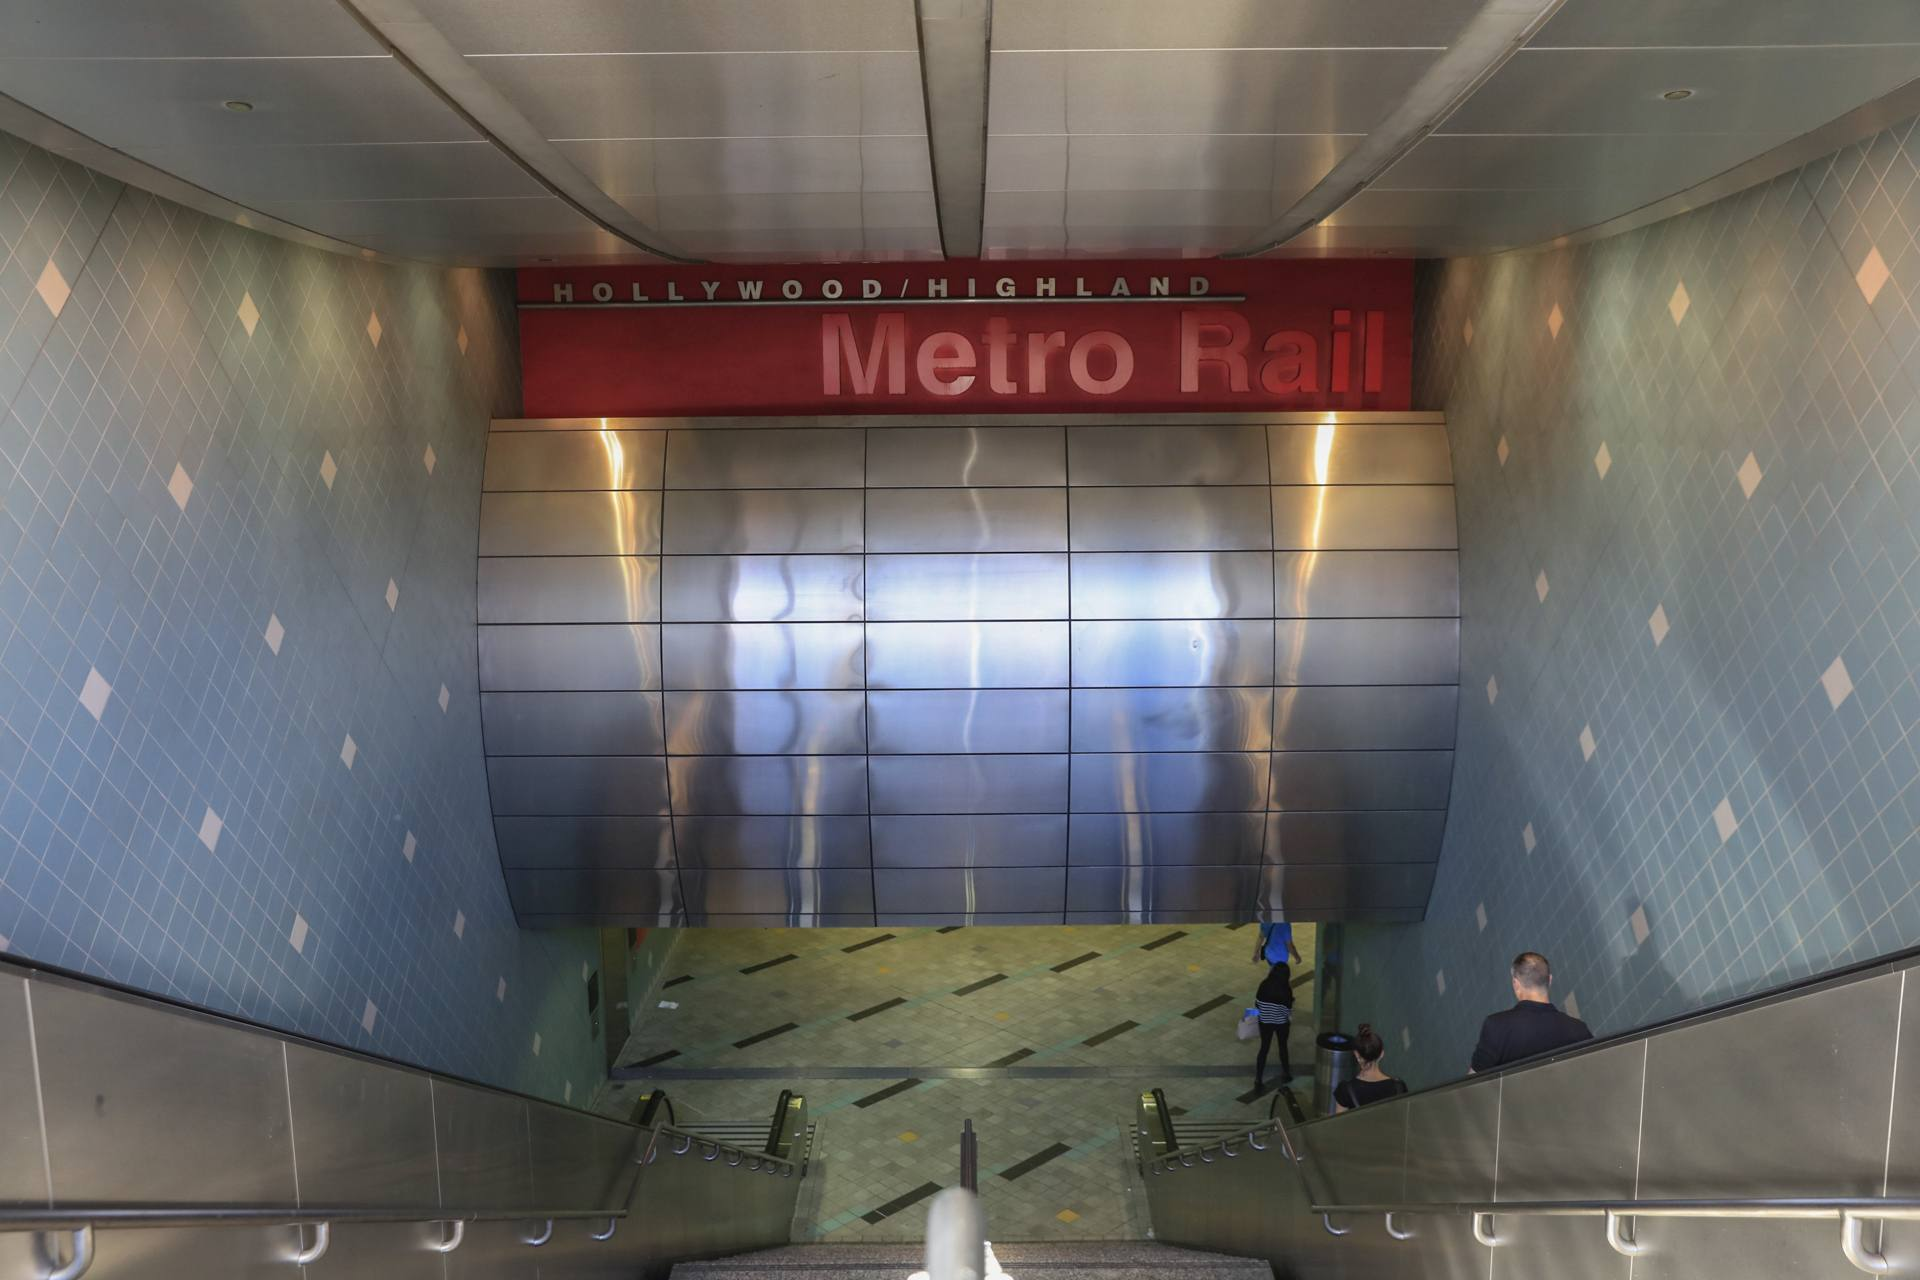 Metro Station at Hollywood and Highland